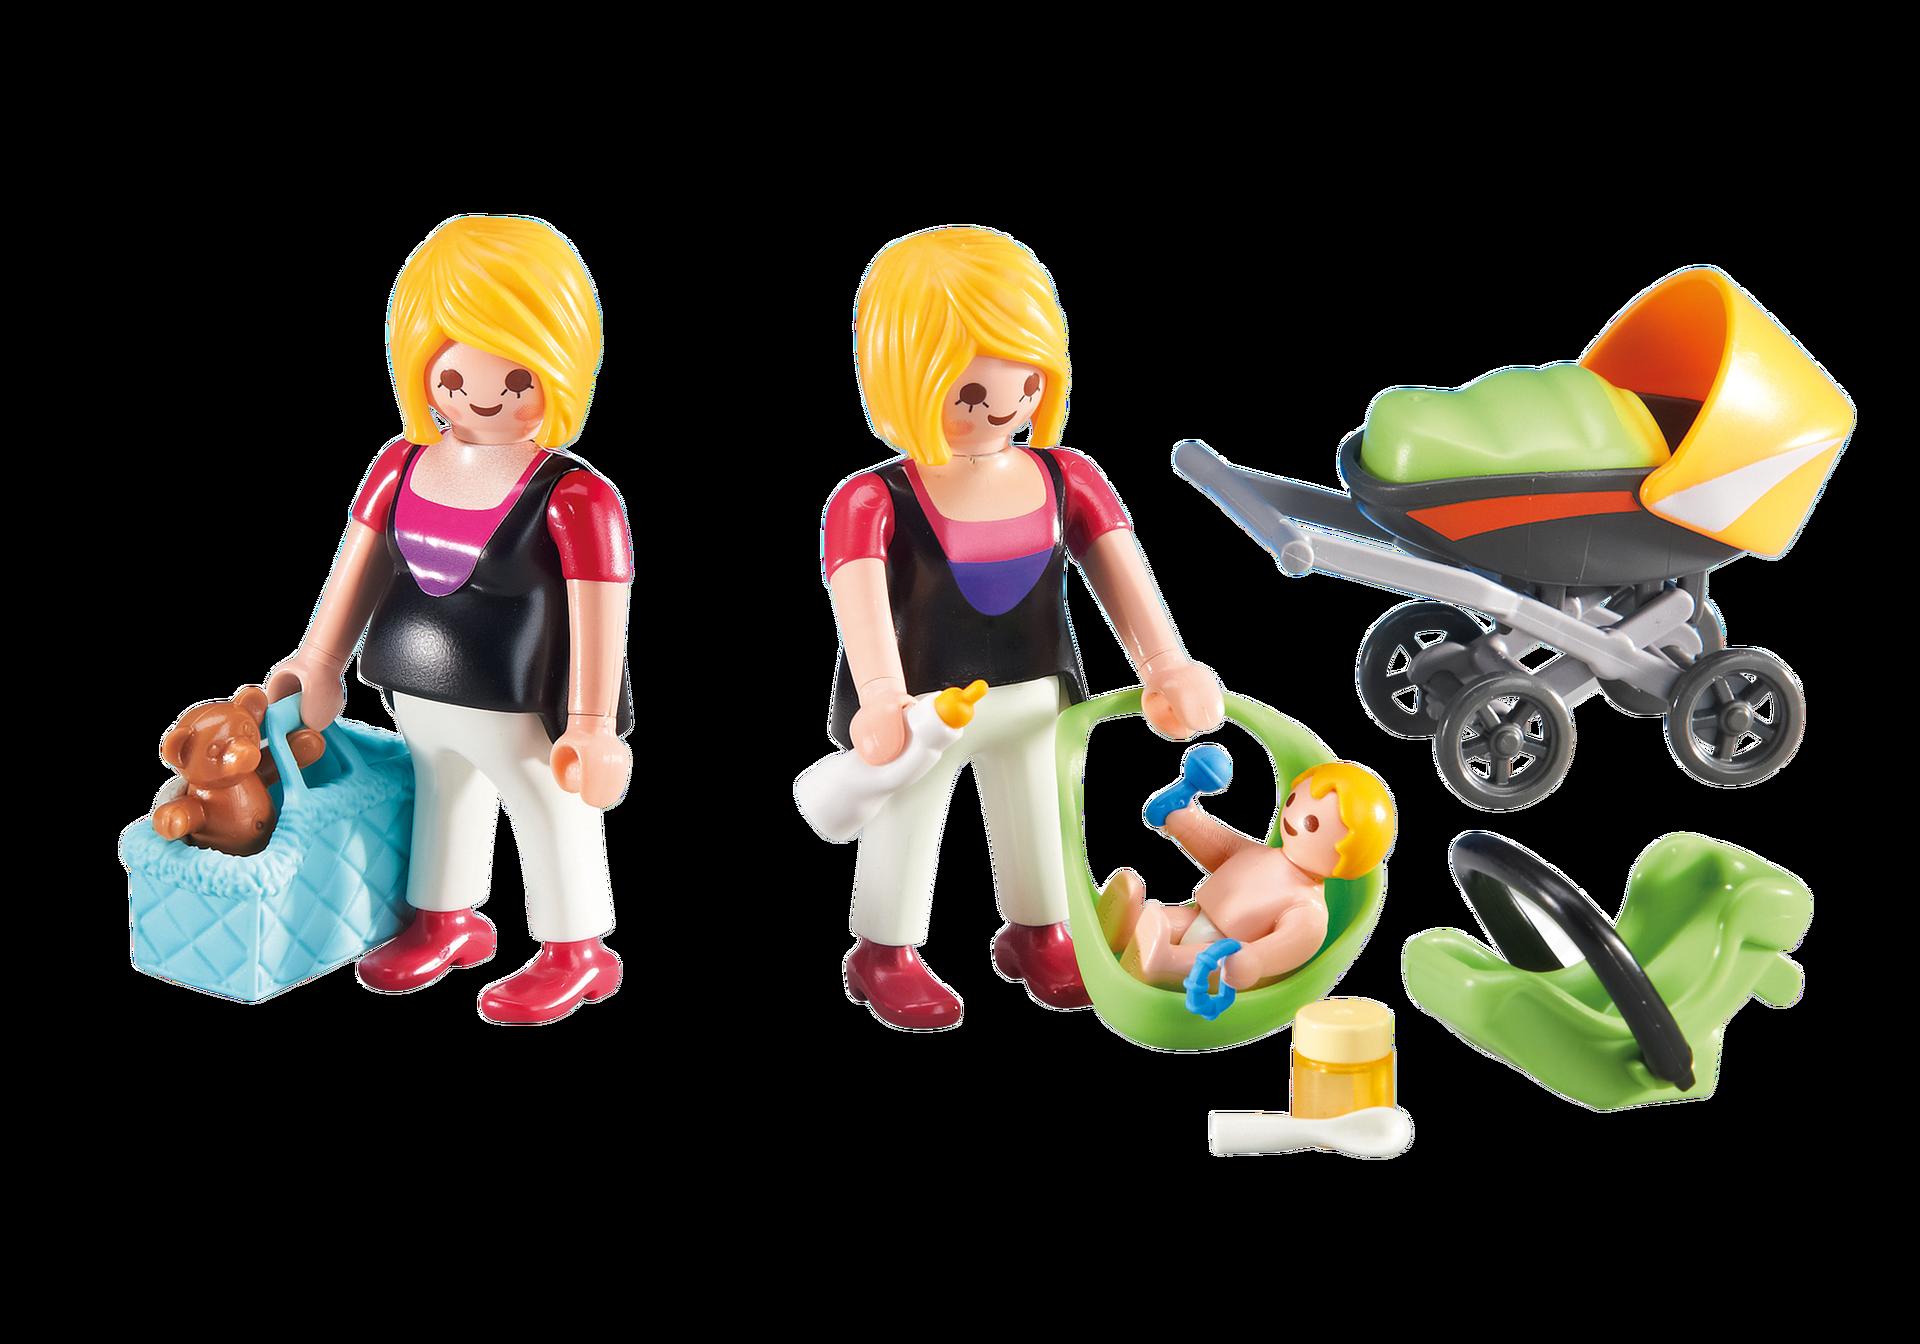 femme enceinte avec maman et b b 6447 playmobil france. Black Bedroom Furniture Sets. Home Design Ideas